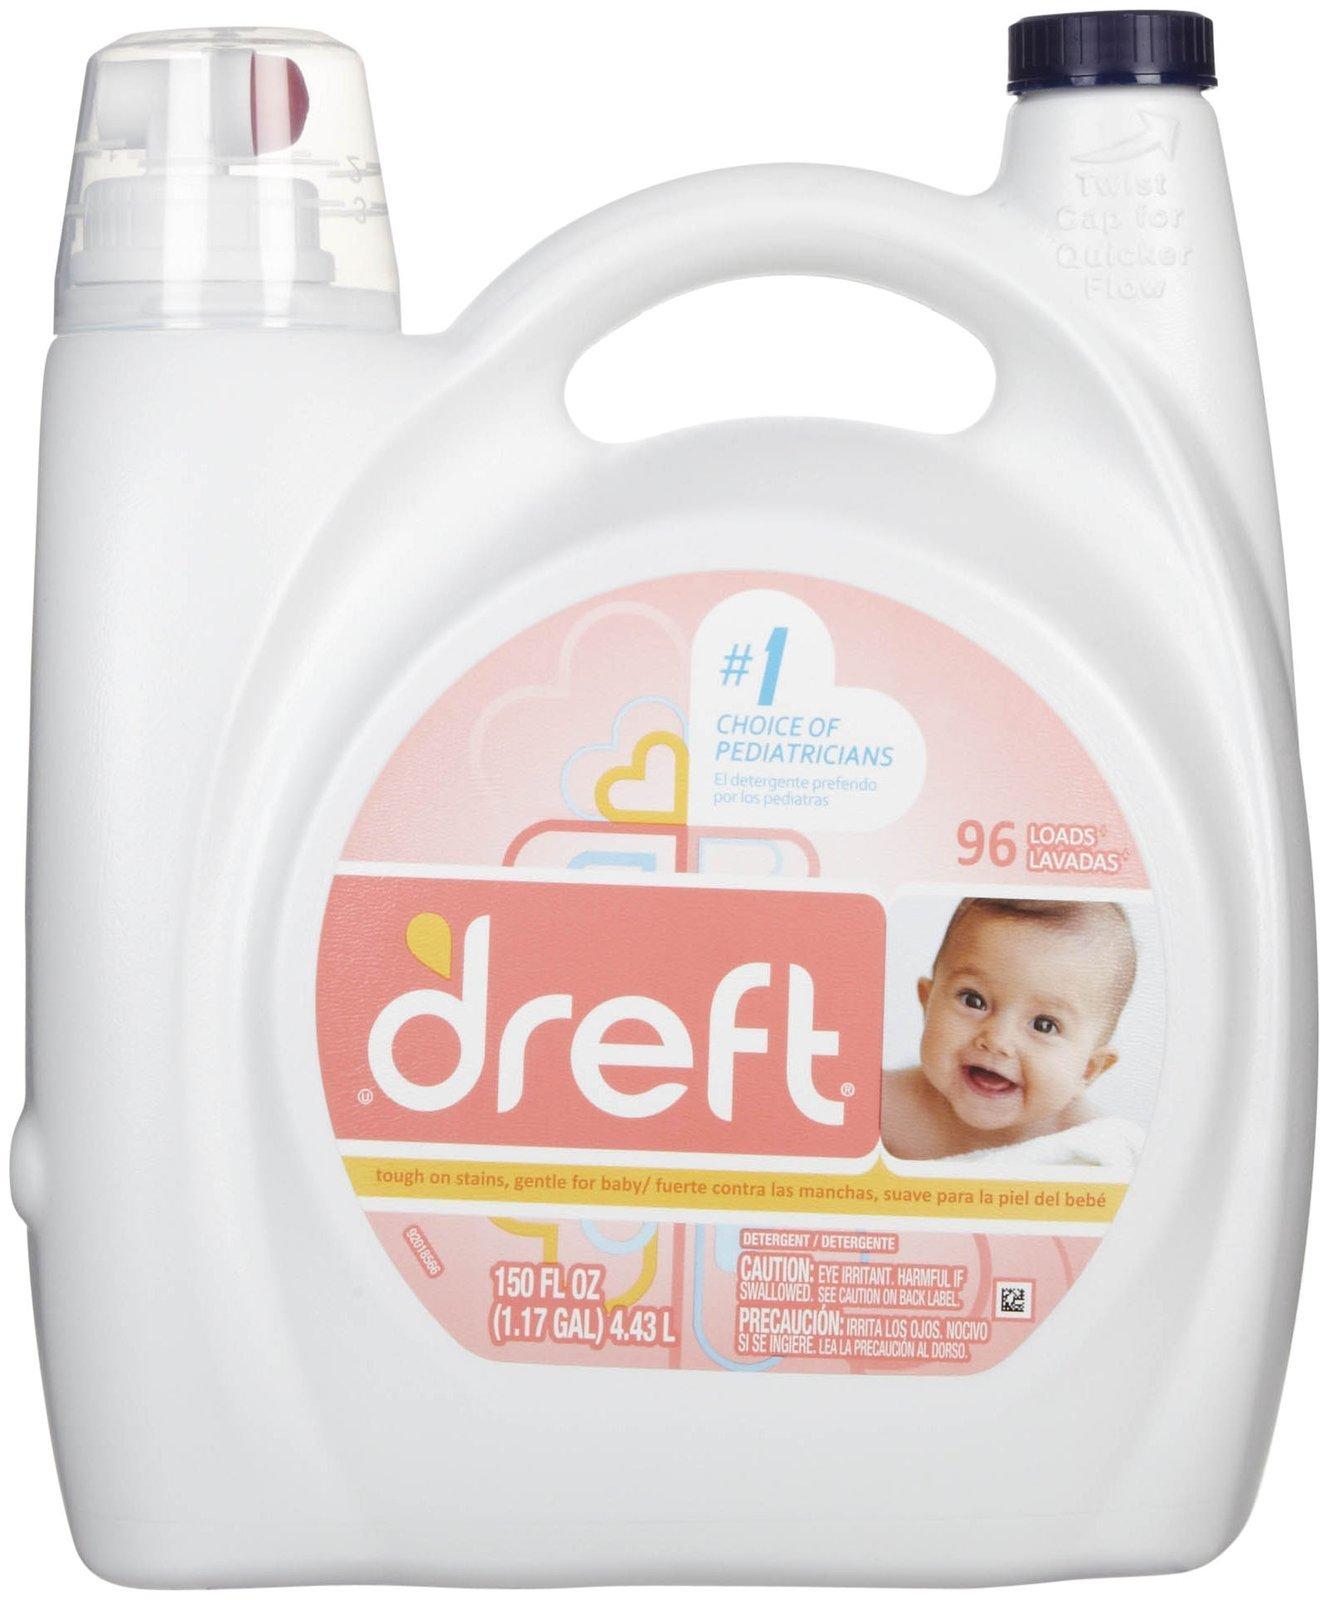 Dreft Baby Laundry Detergent - 150 fl oz by Dreft